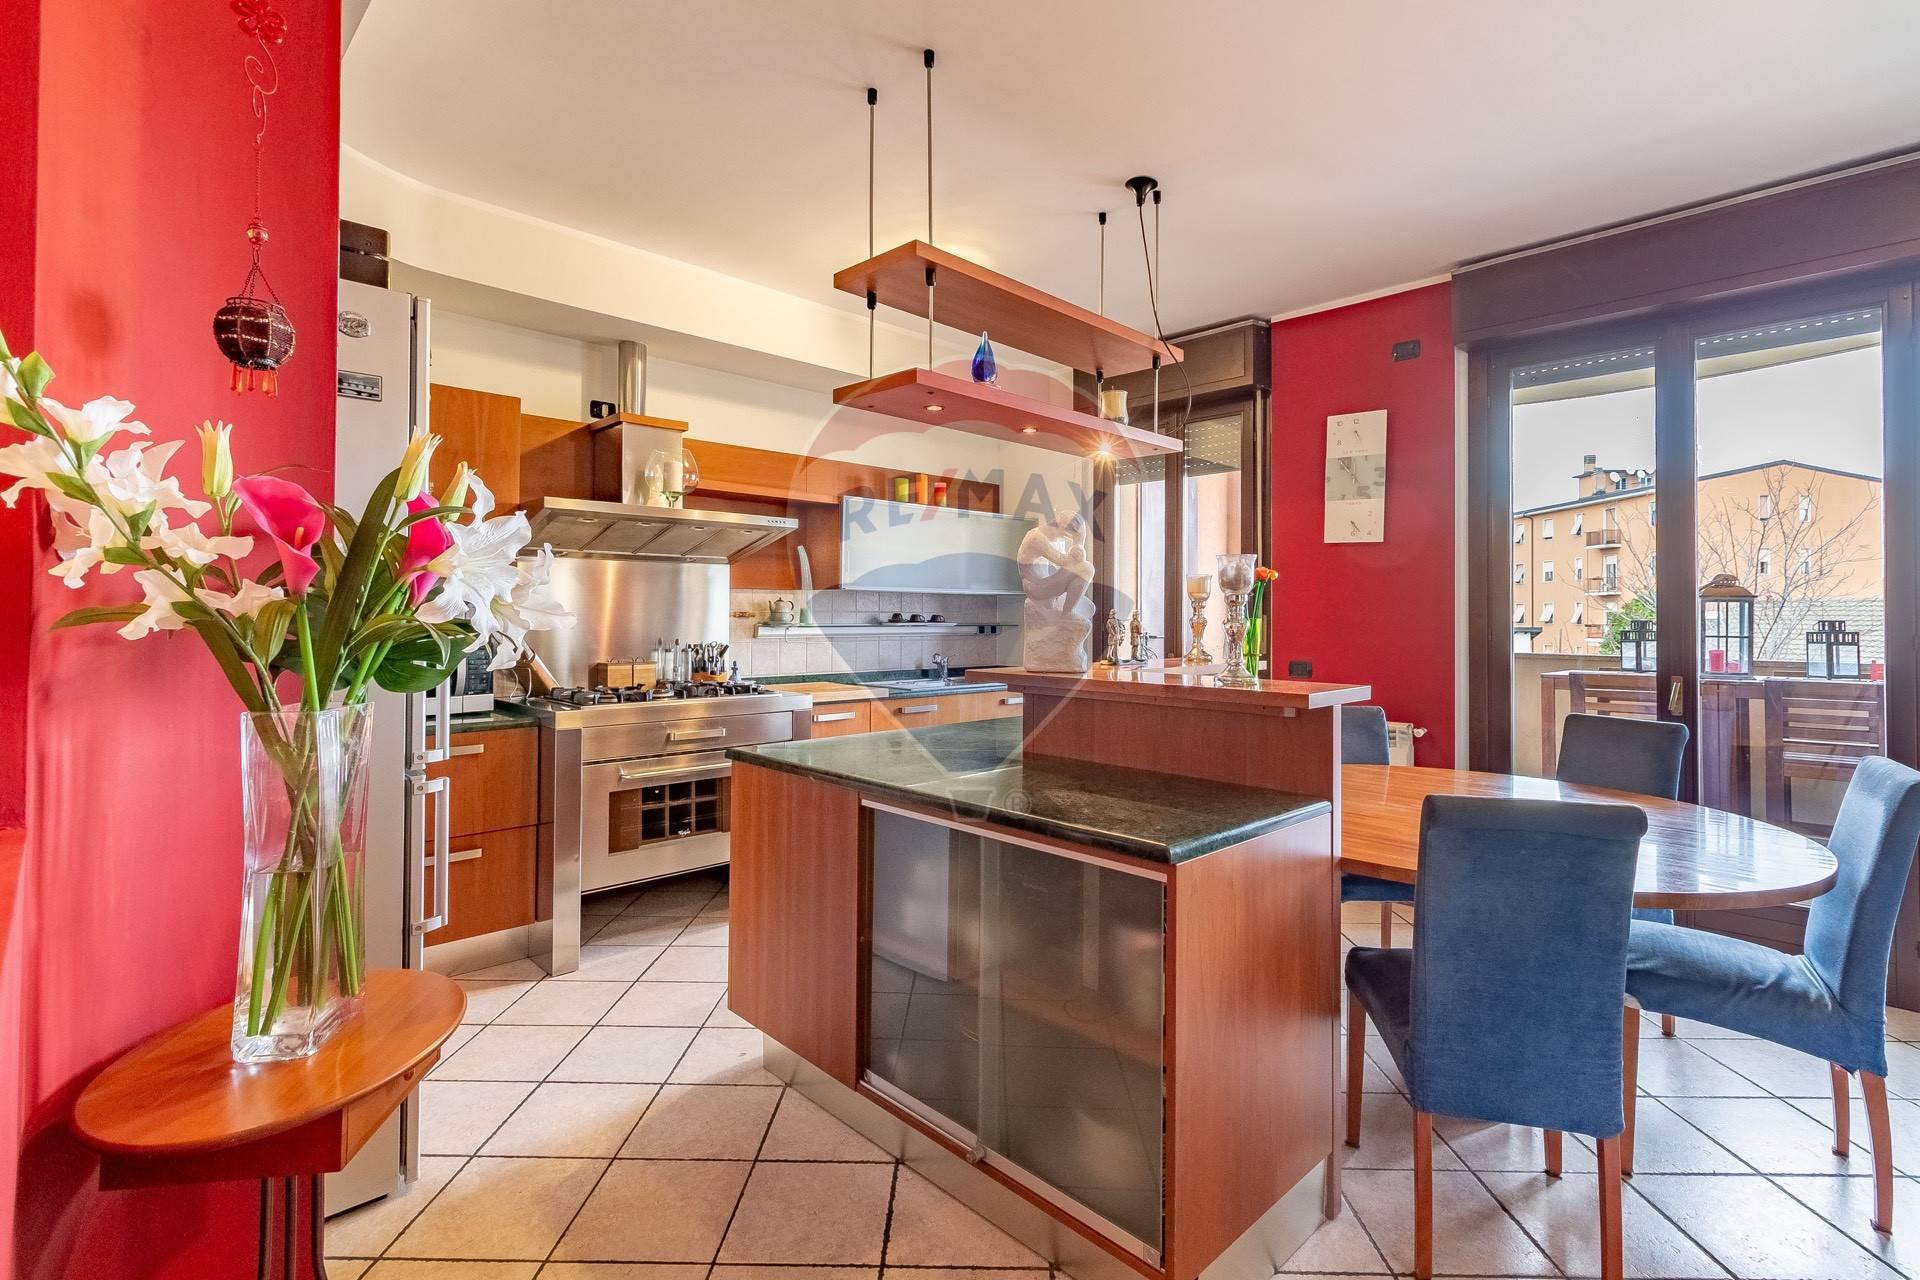 Appartamento in vendita via Salvatore Barbieri Brugherio